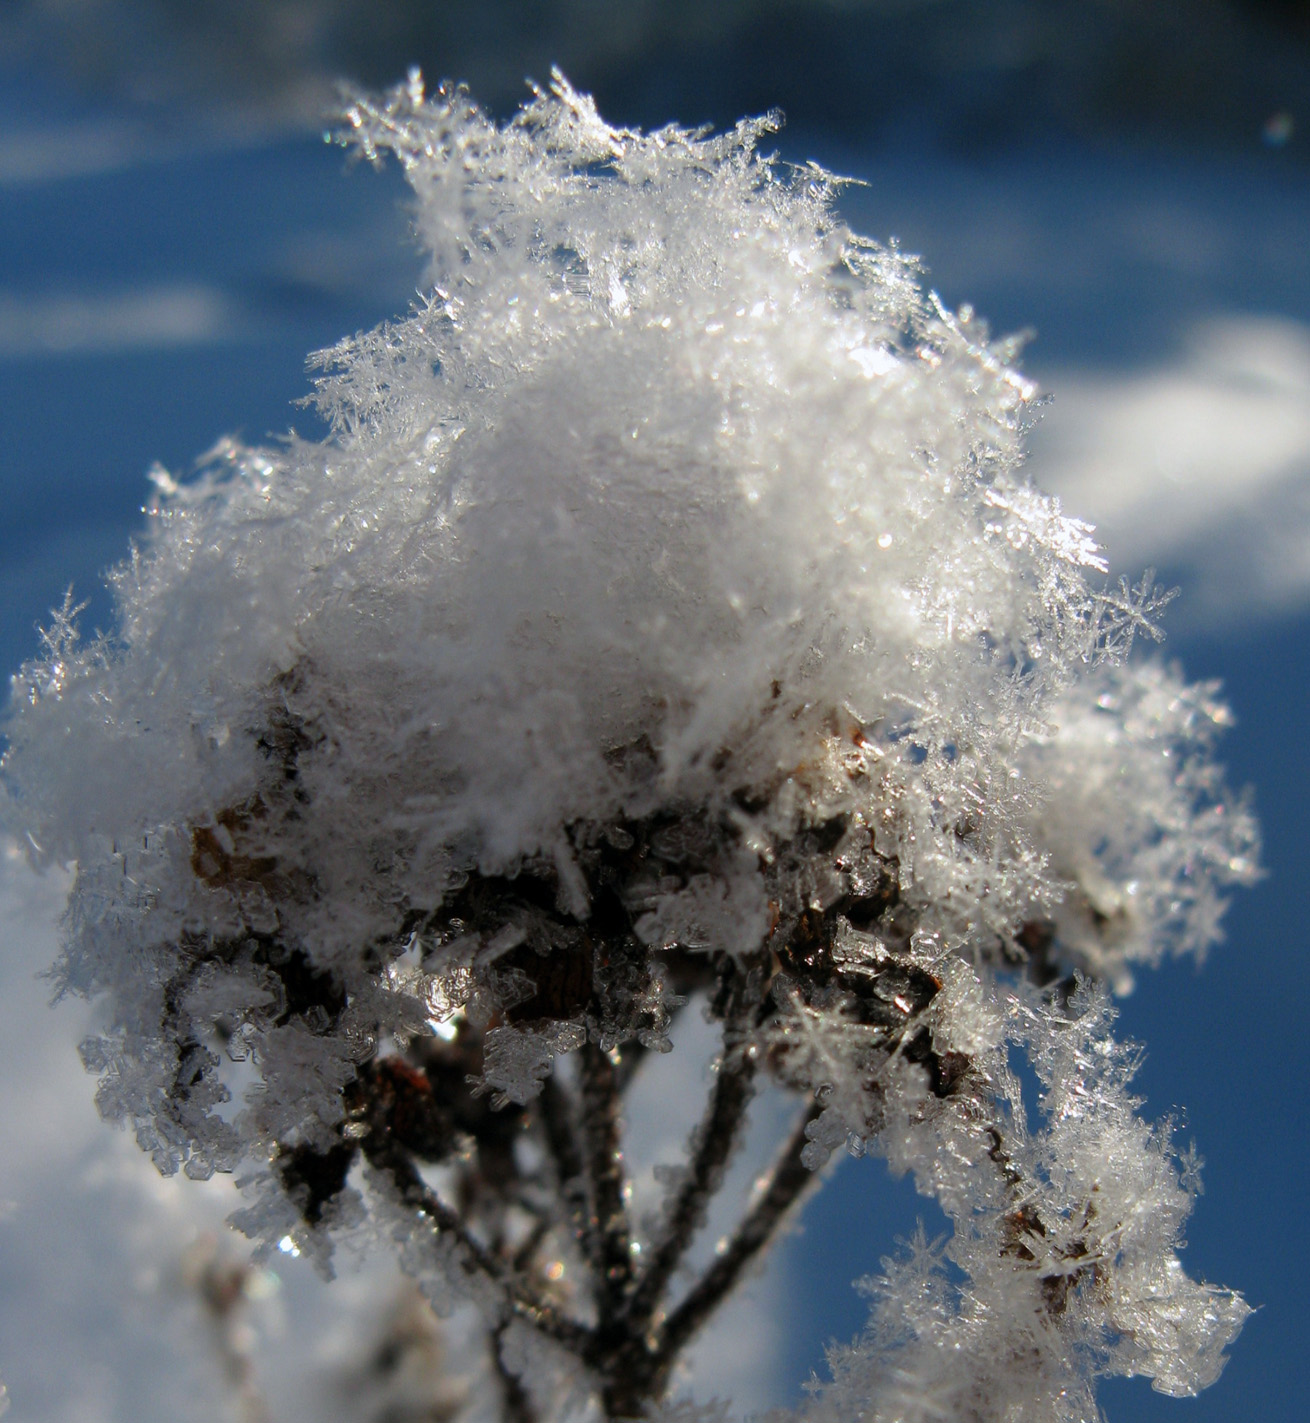 Snöpuff